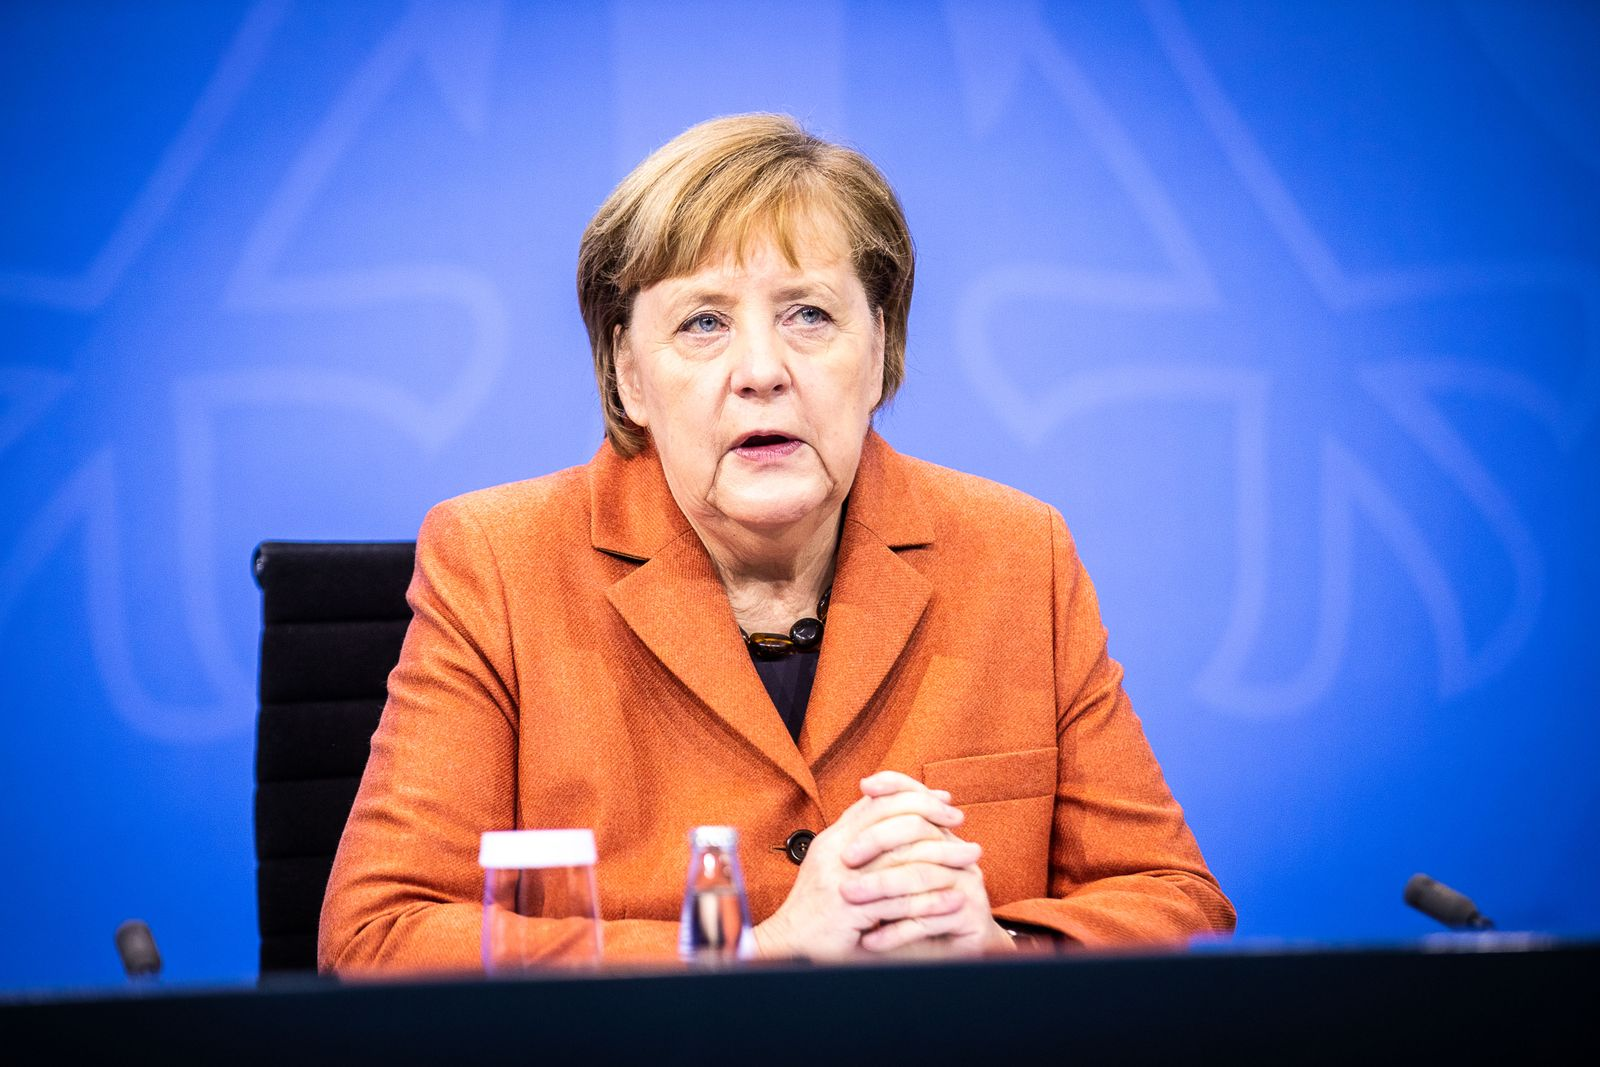 Presser after German Chancellor Merkel's video conference with German State Premiers about coronavirus measures, Deutschland, Germany - 13 Dec 2020